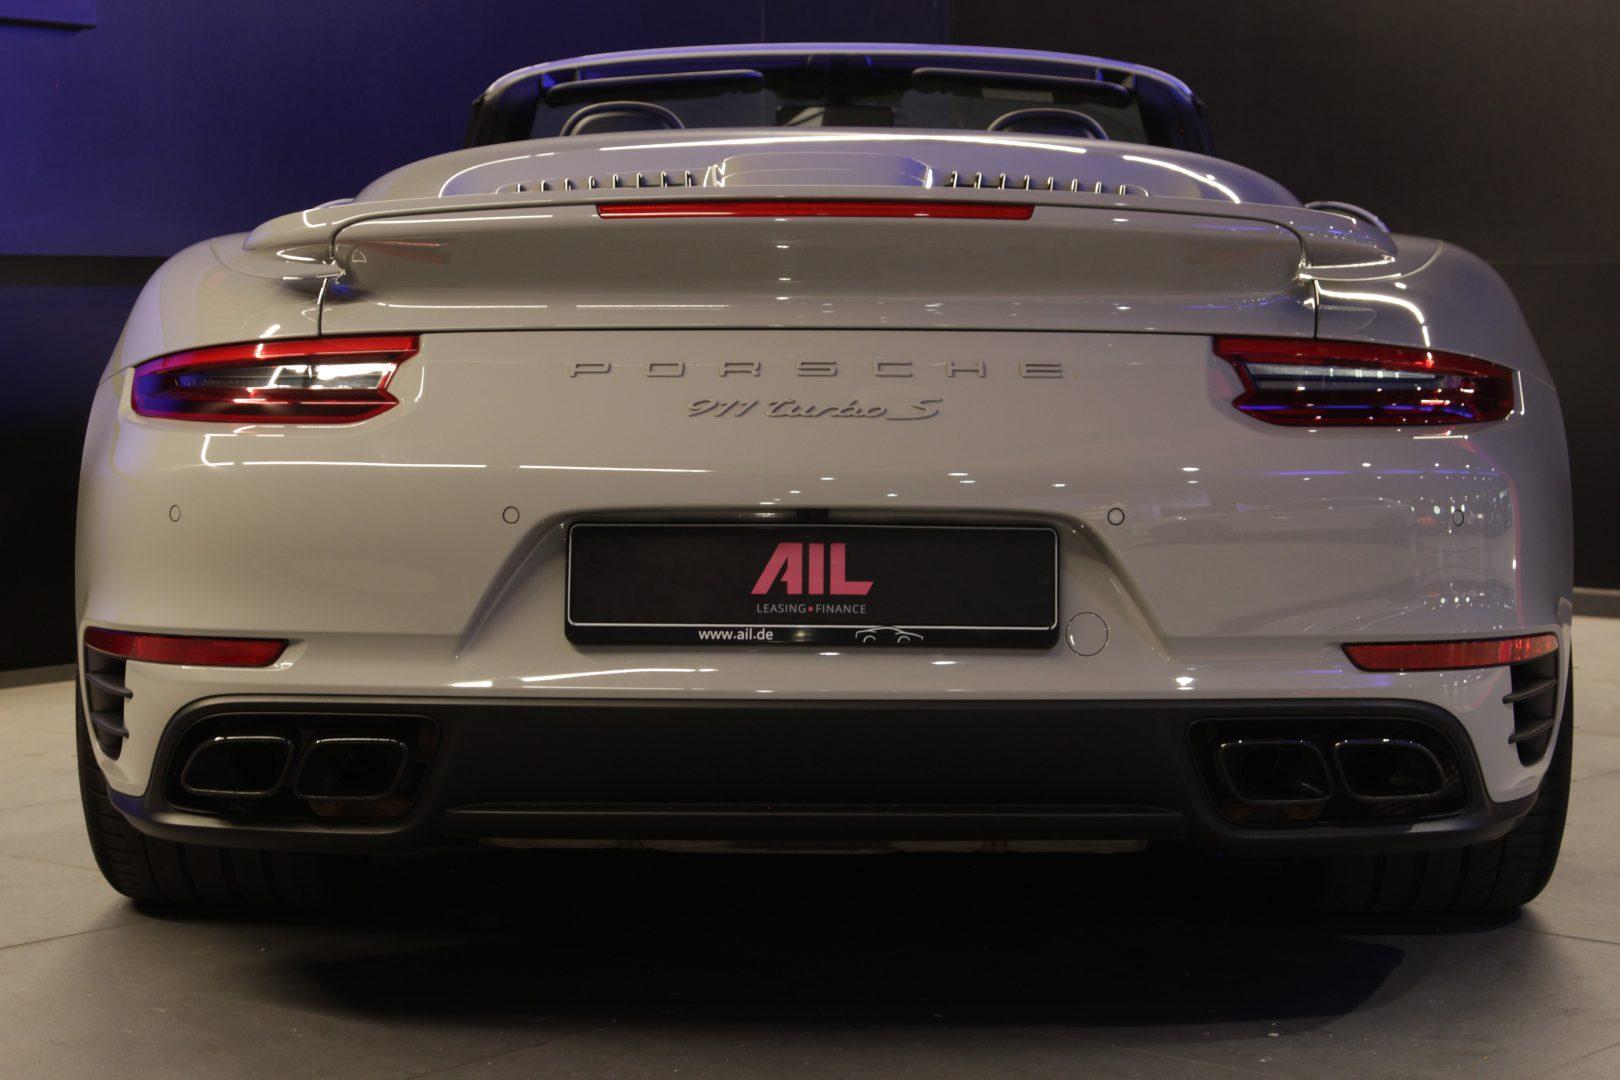 AIL Porsche 991 Turbo S Cabriolet 4